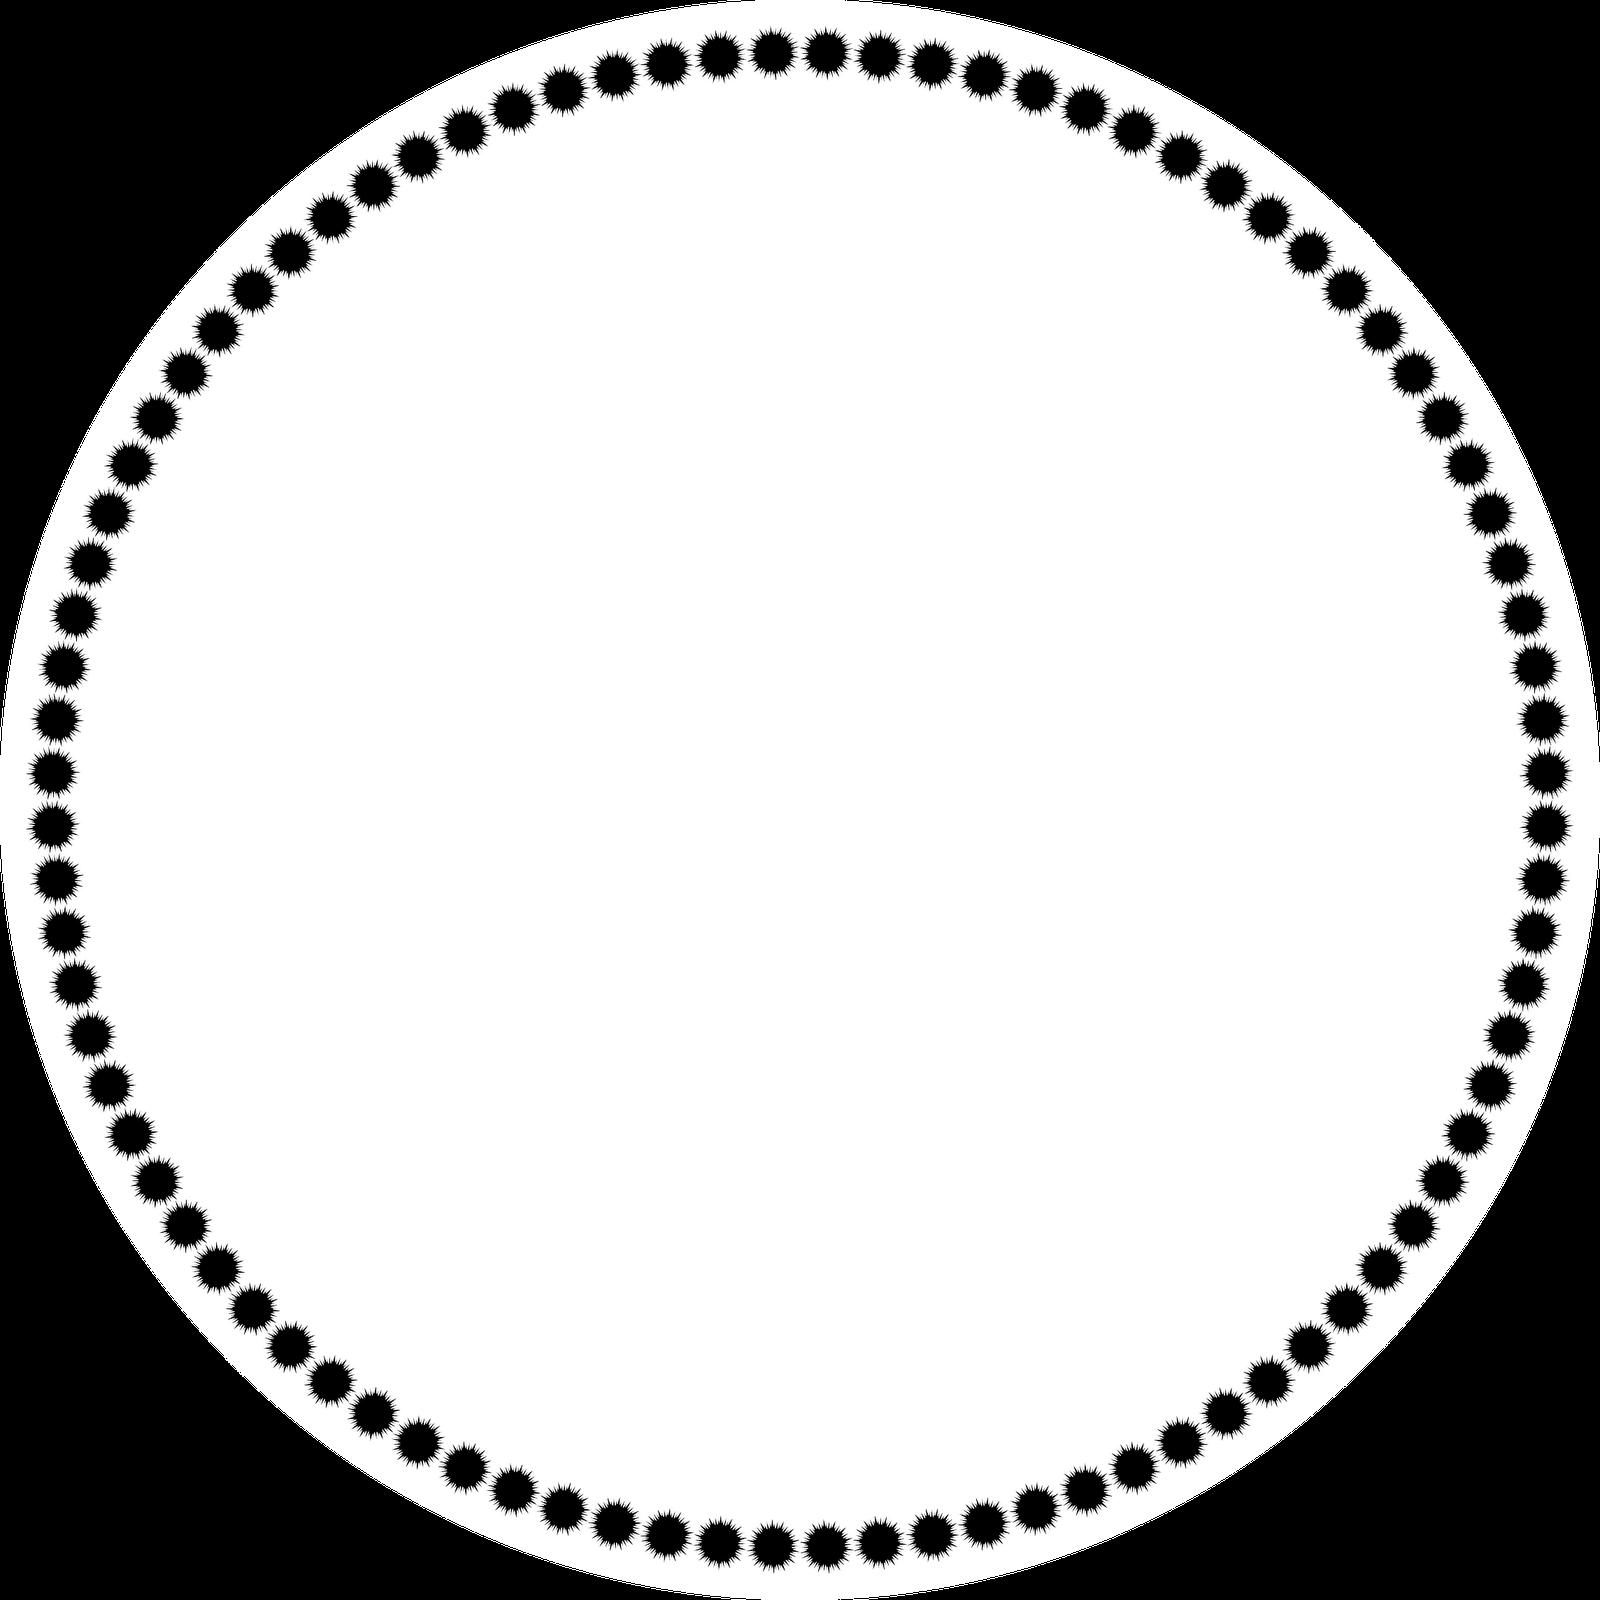 Free Circle Border Cliparts, Download Free Clip Art, Free.